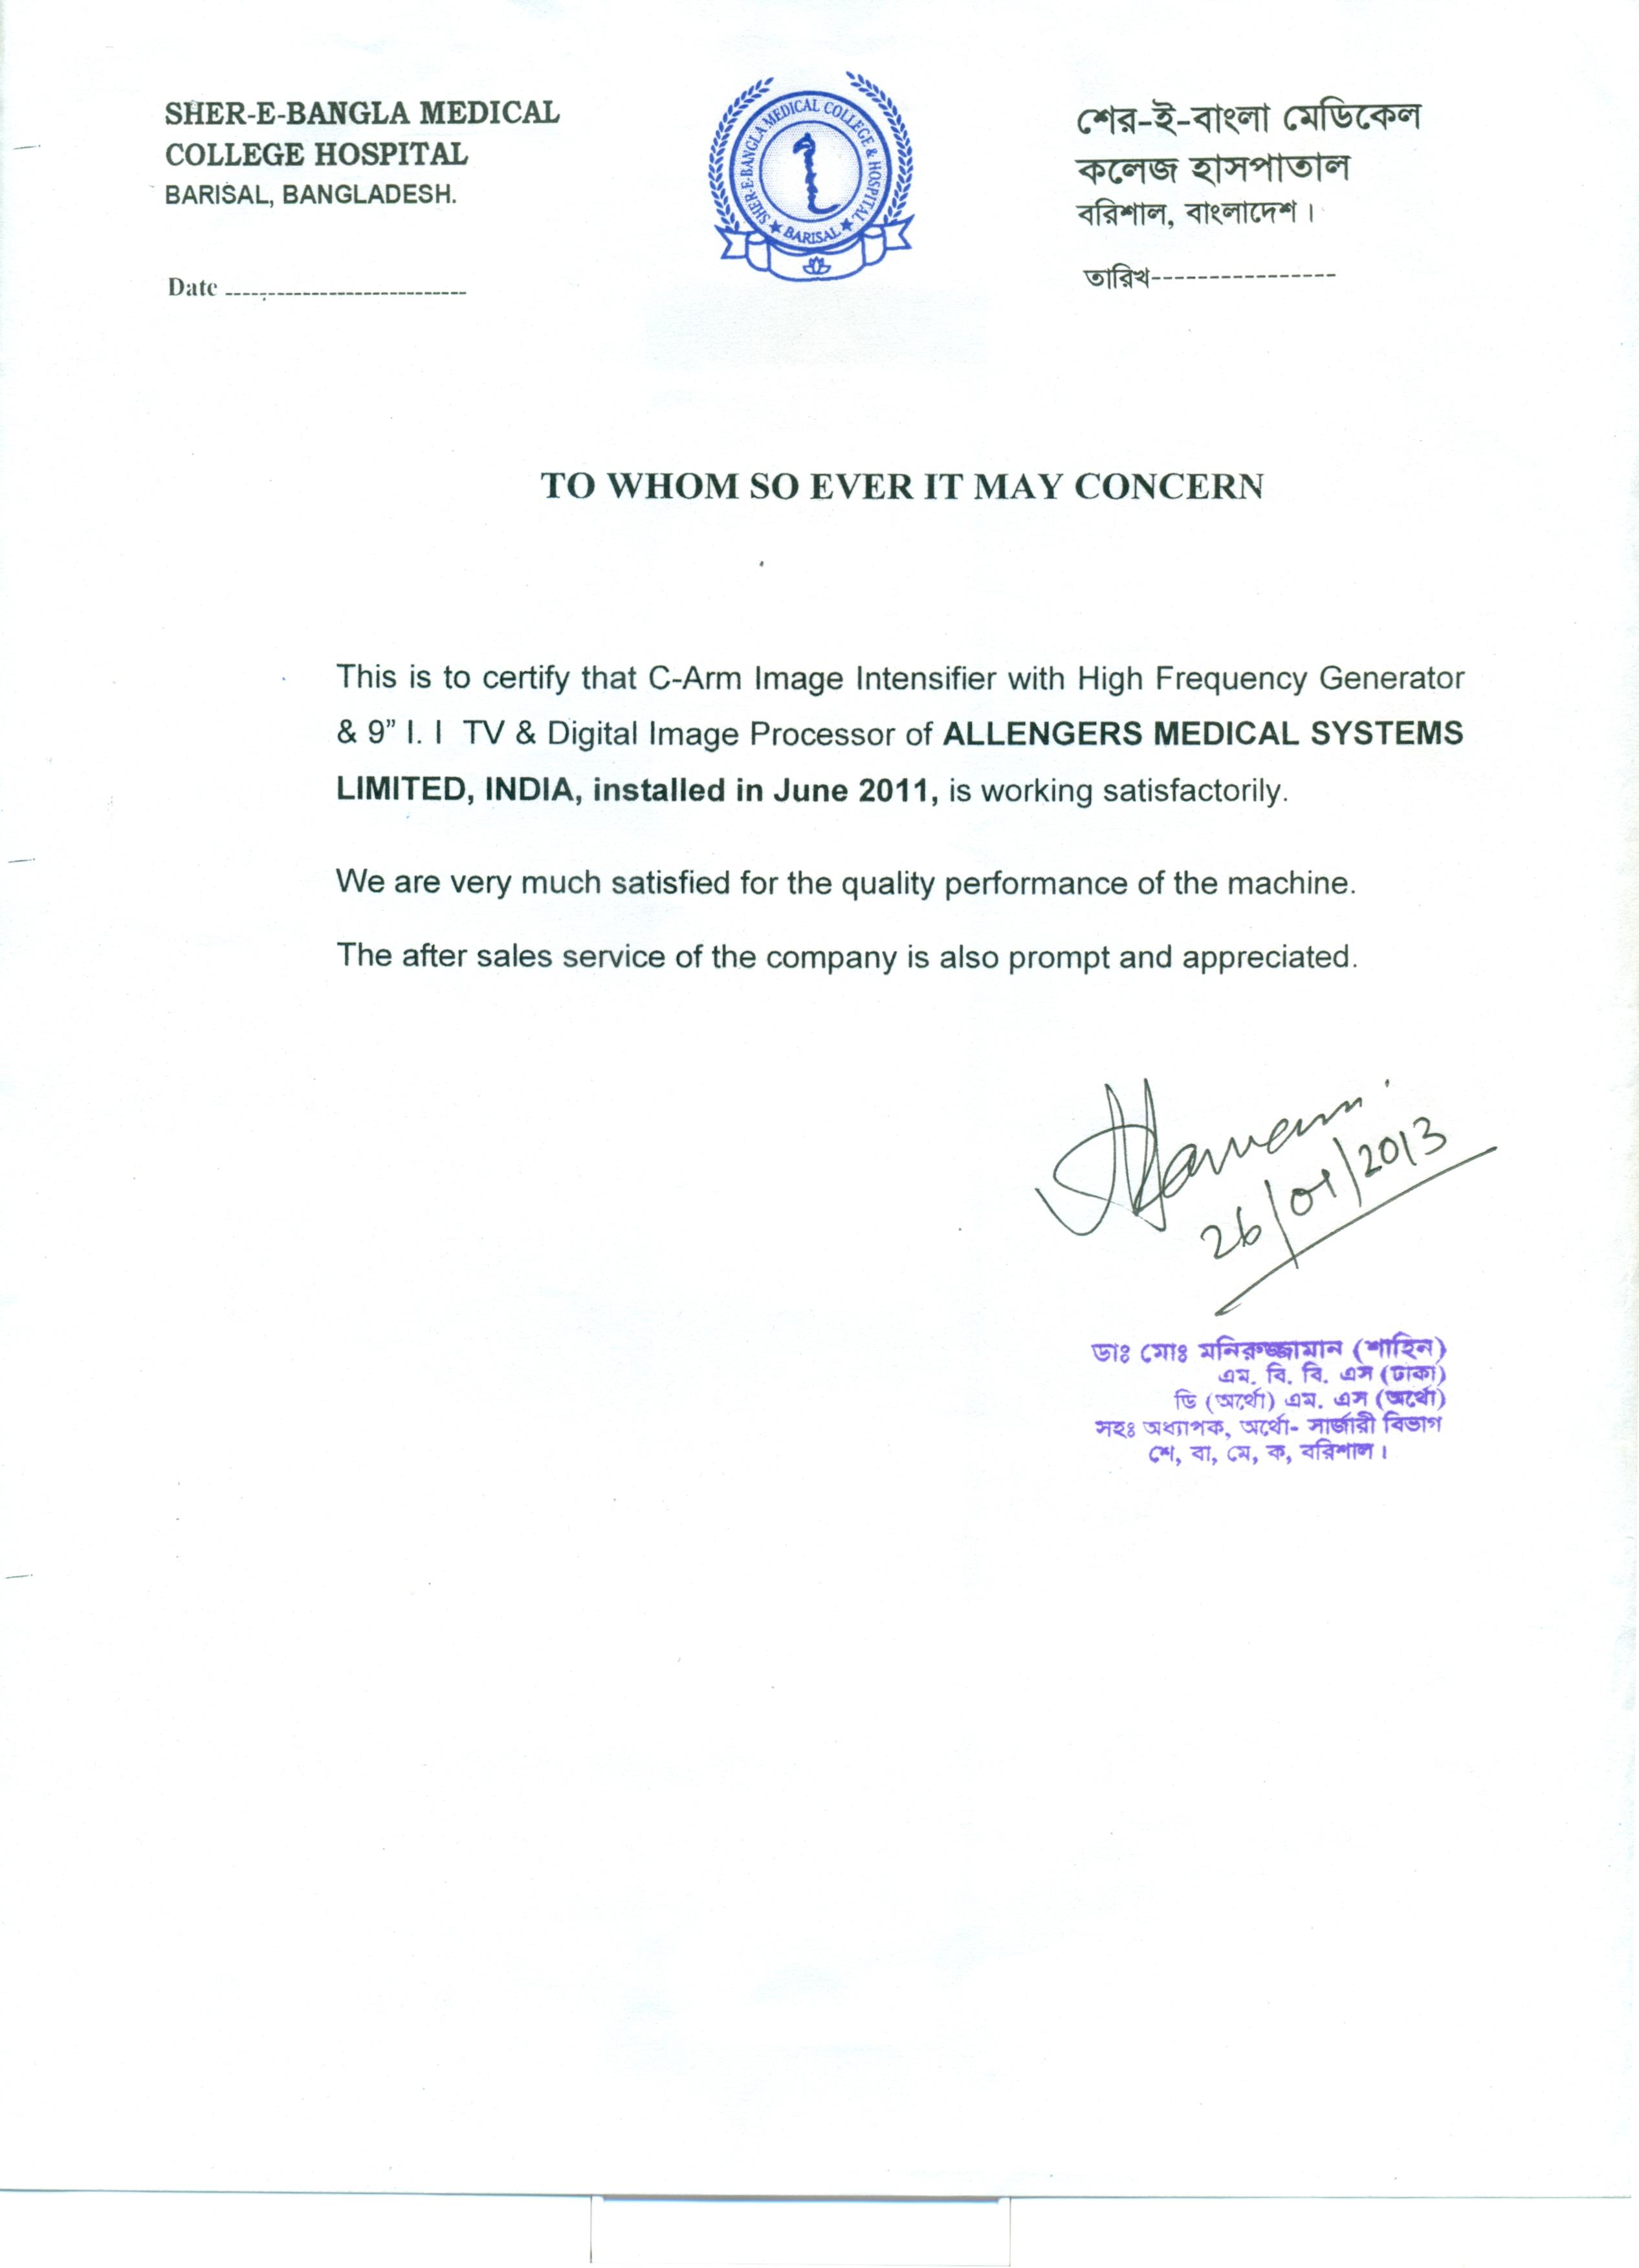 SHER-E-BANGLA